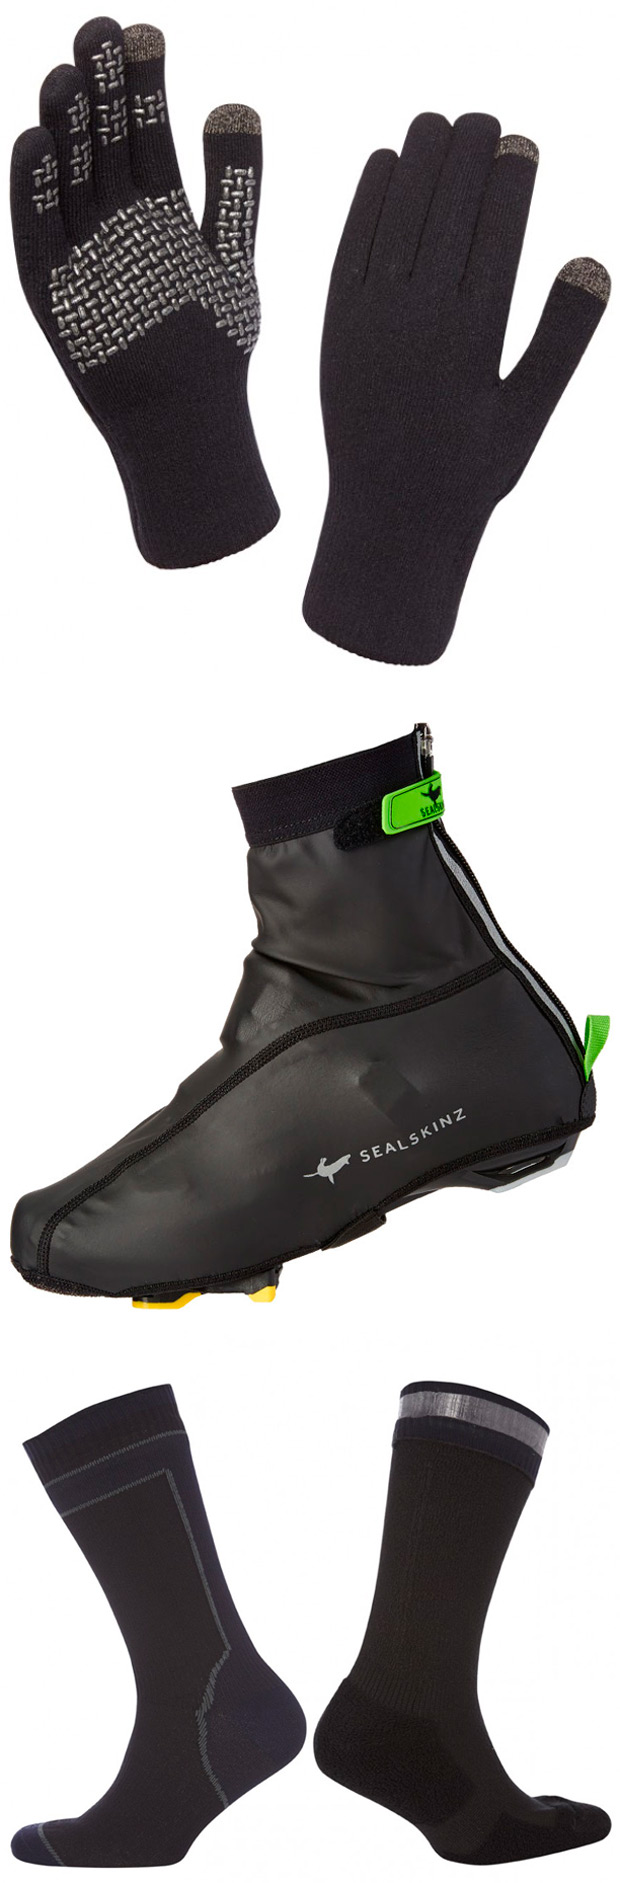 La prendas impermeables de Sealskinz, ya disponibles en España gracias a Bike Office